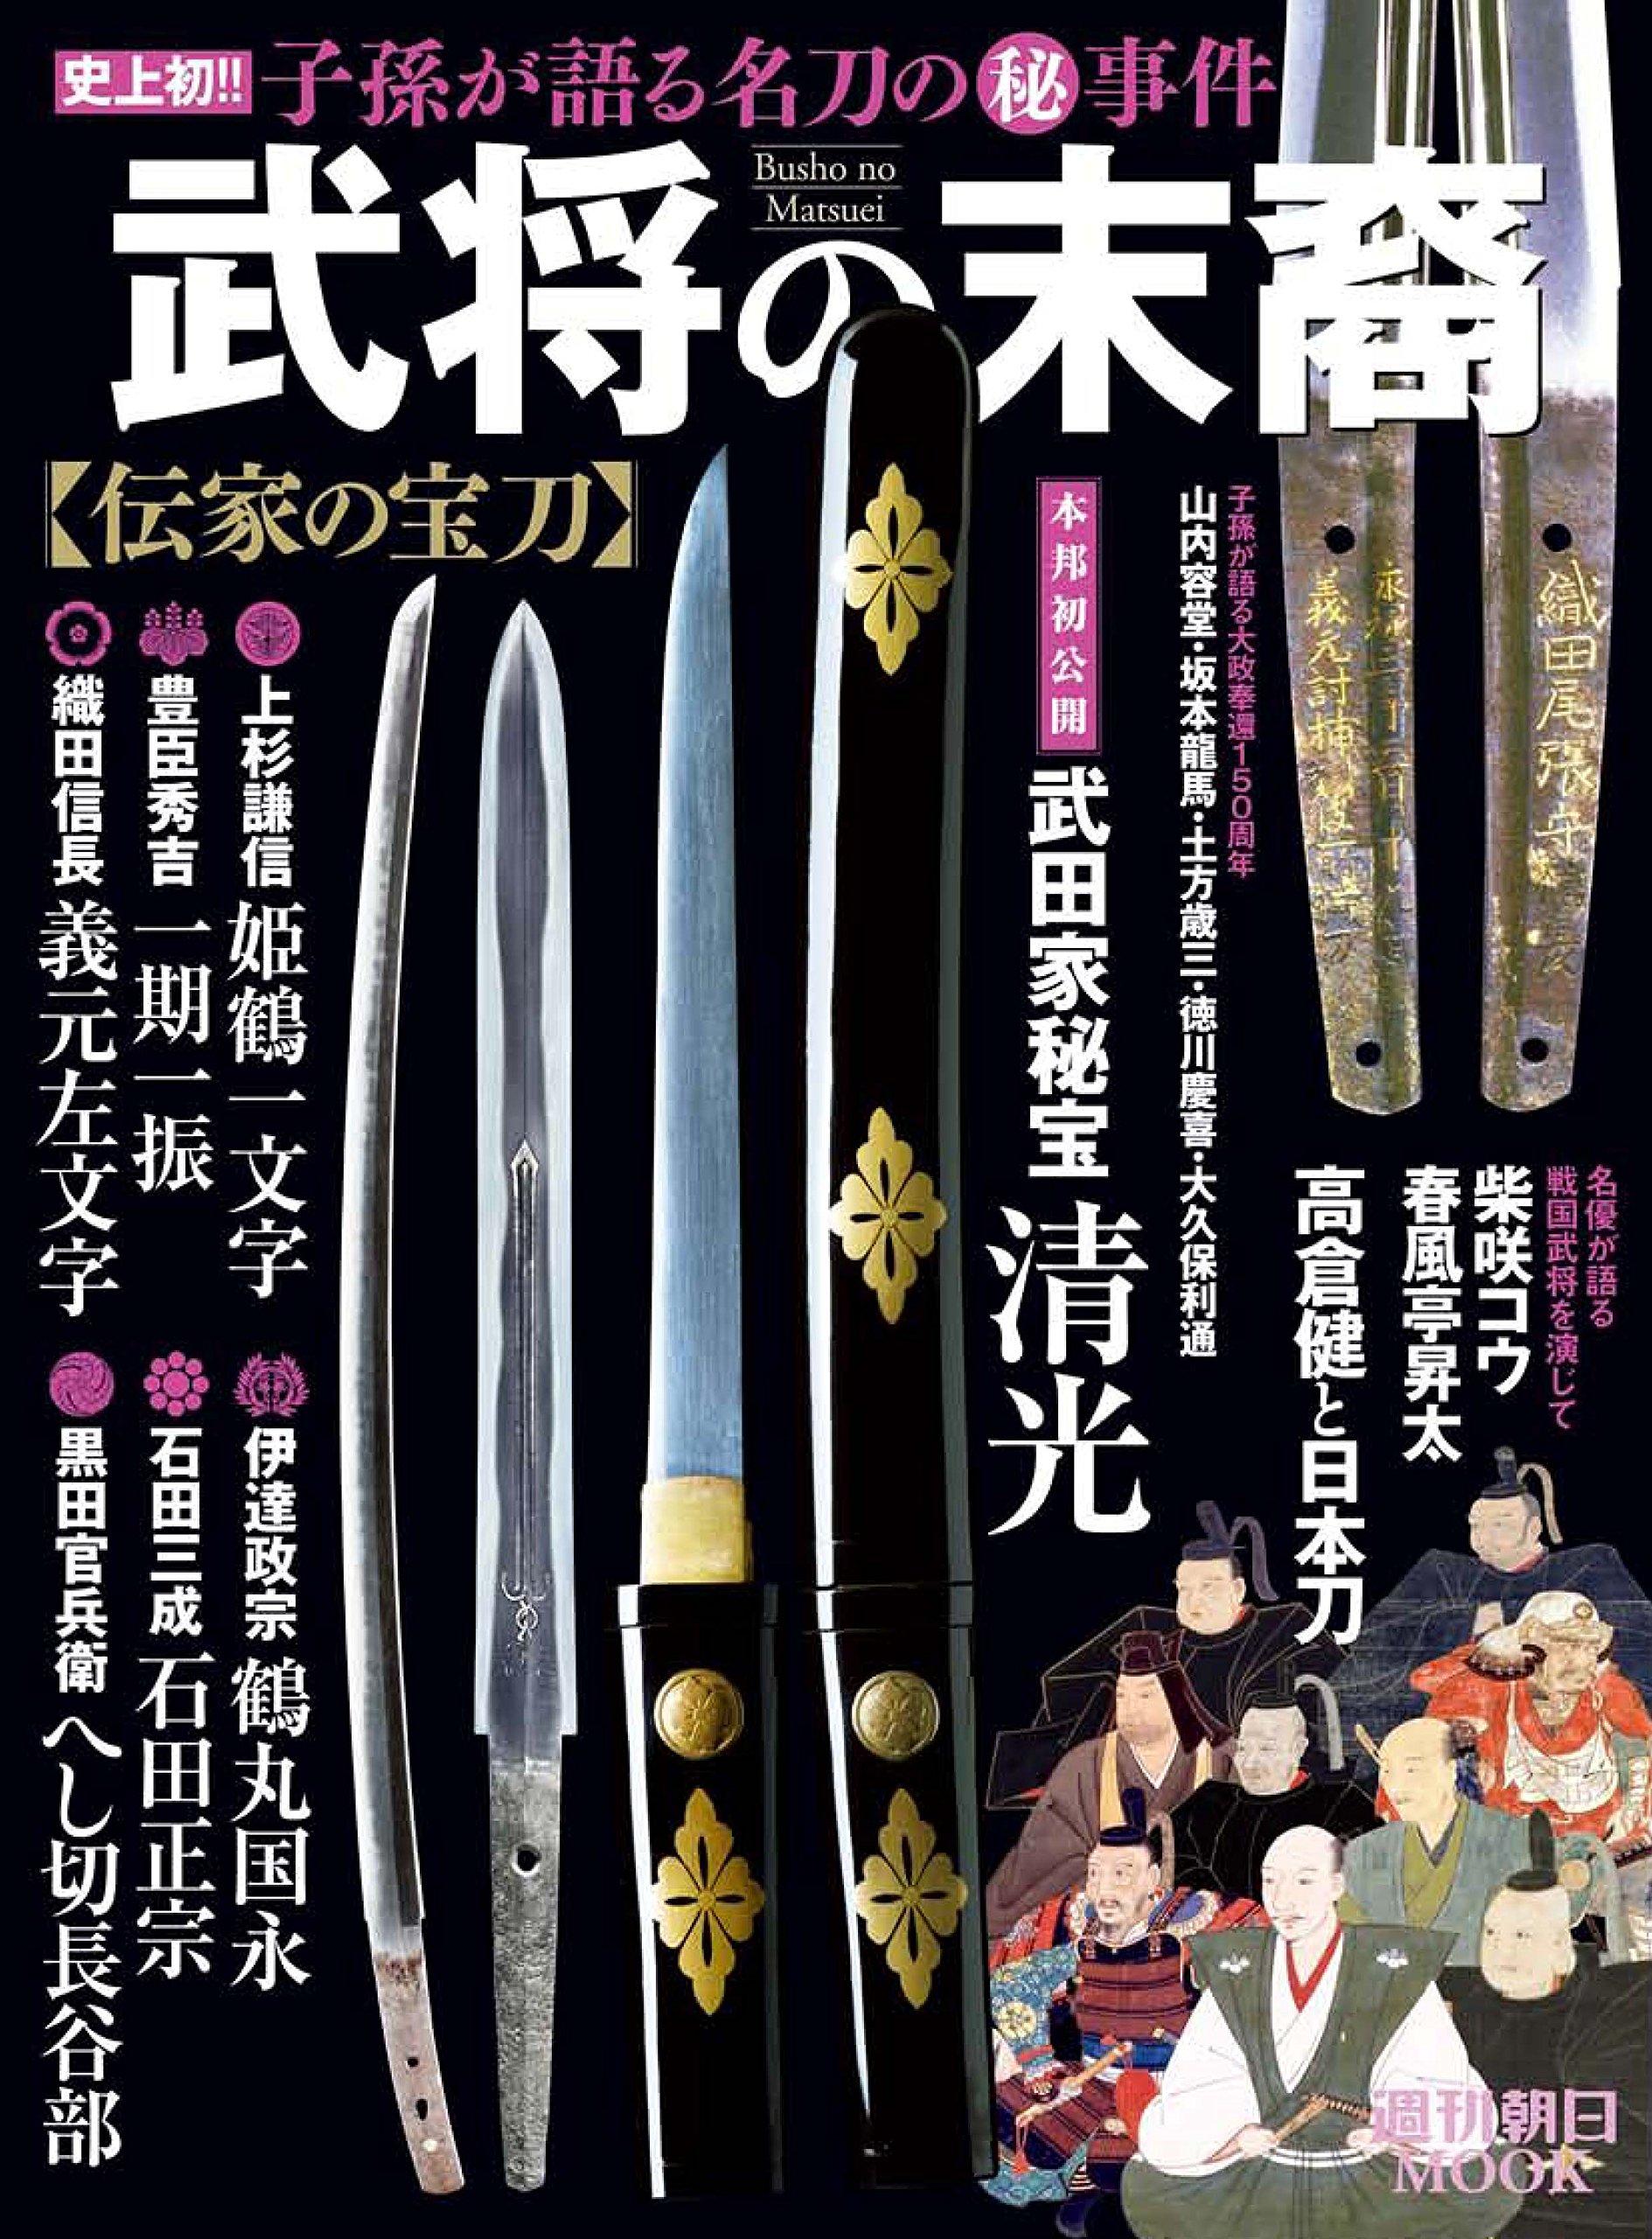 Trump descendants of warlords (weekly Asahi Mook) pdf